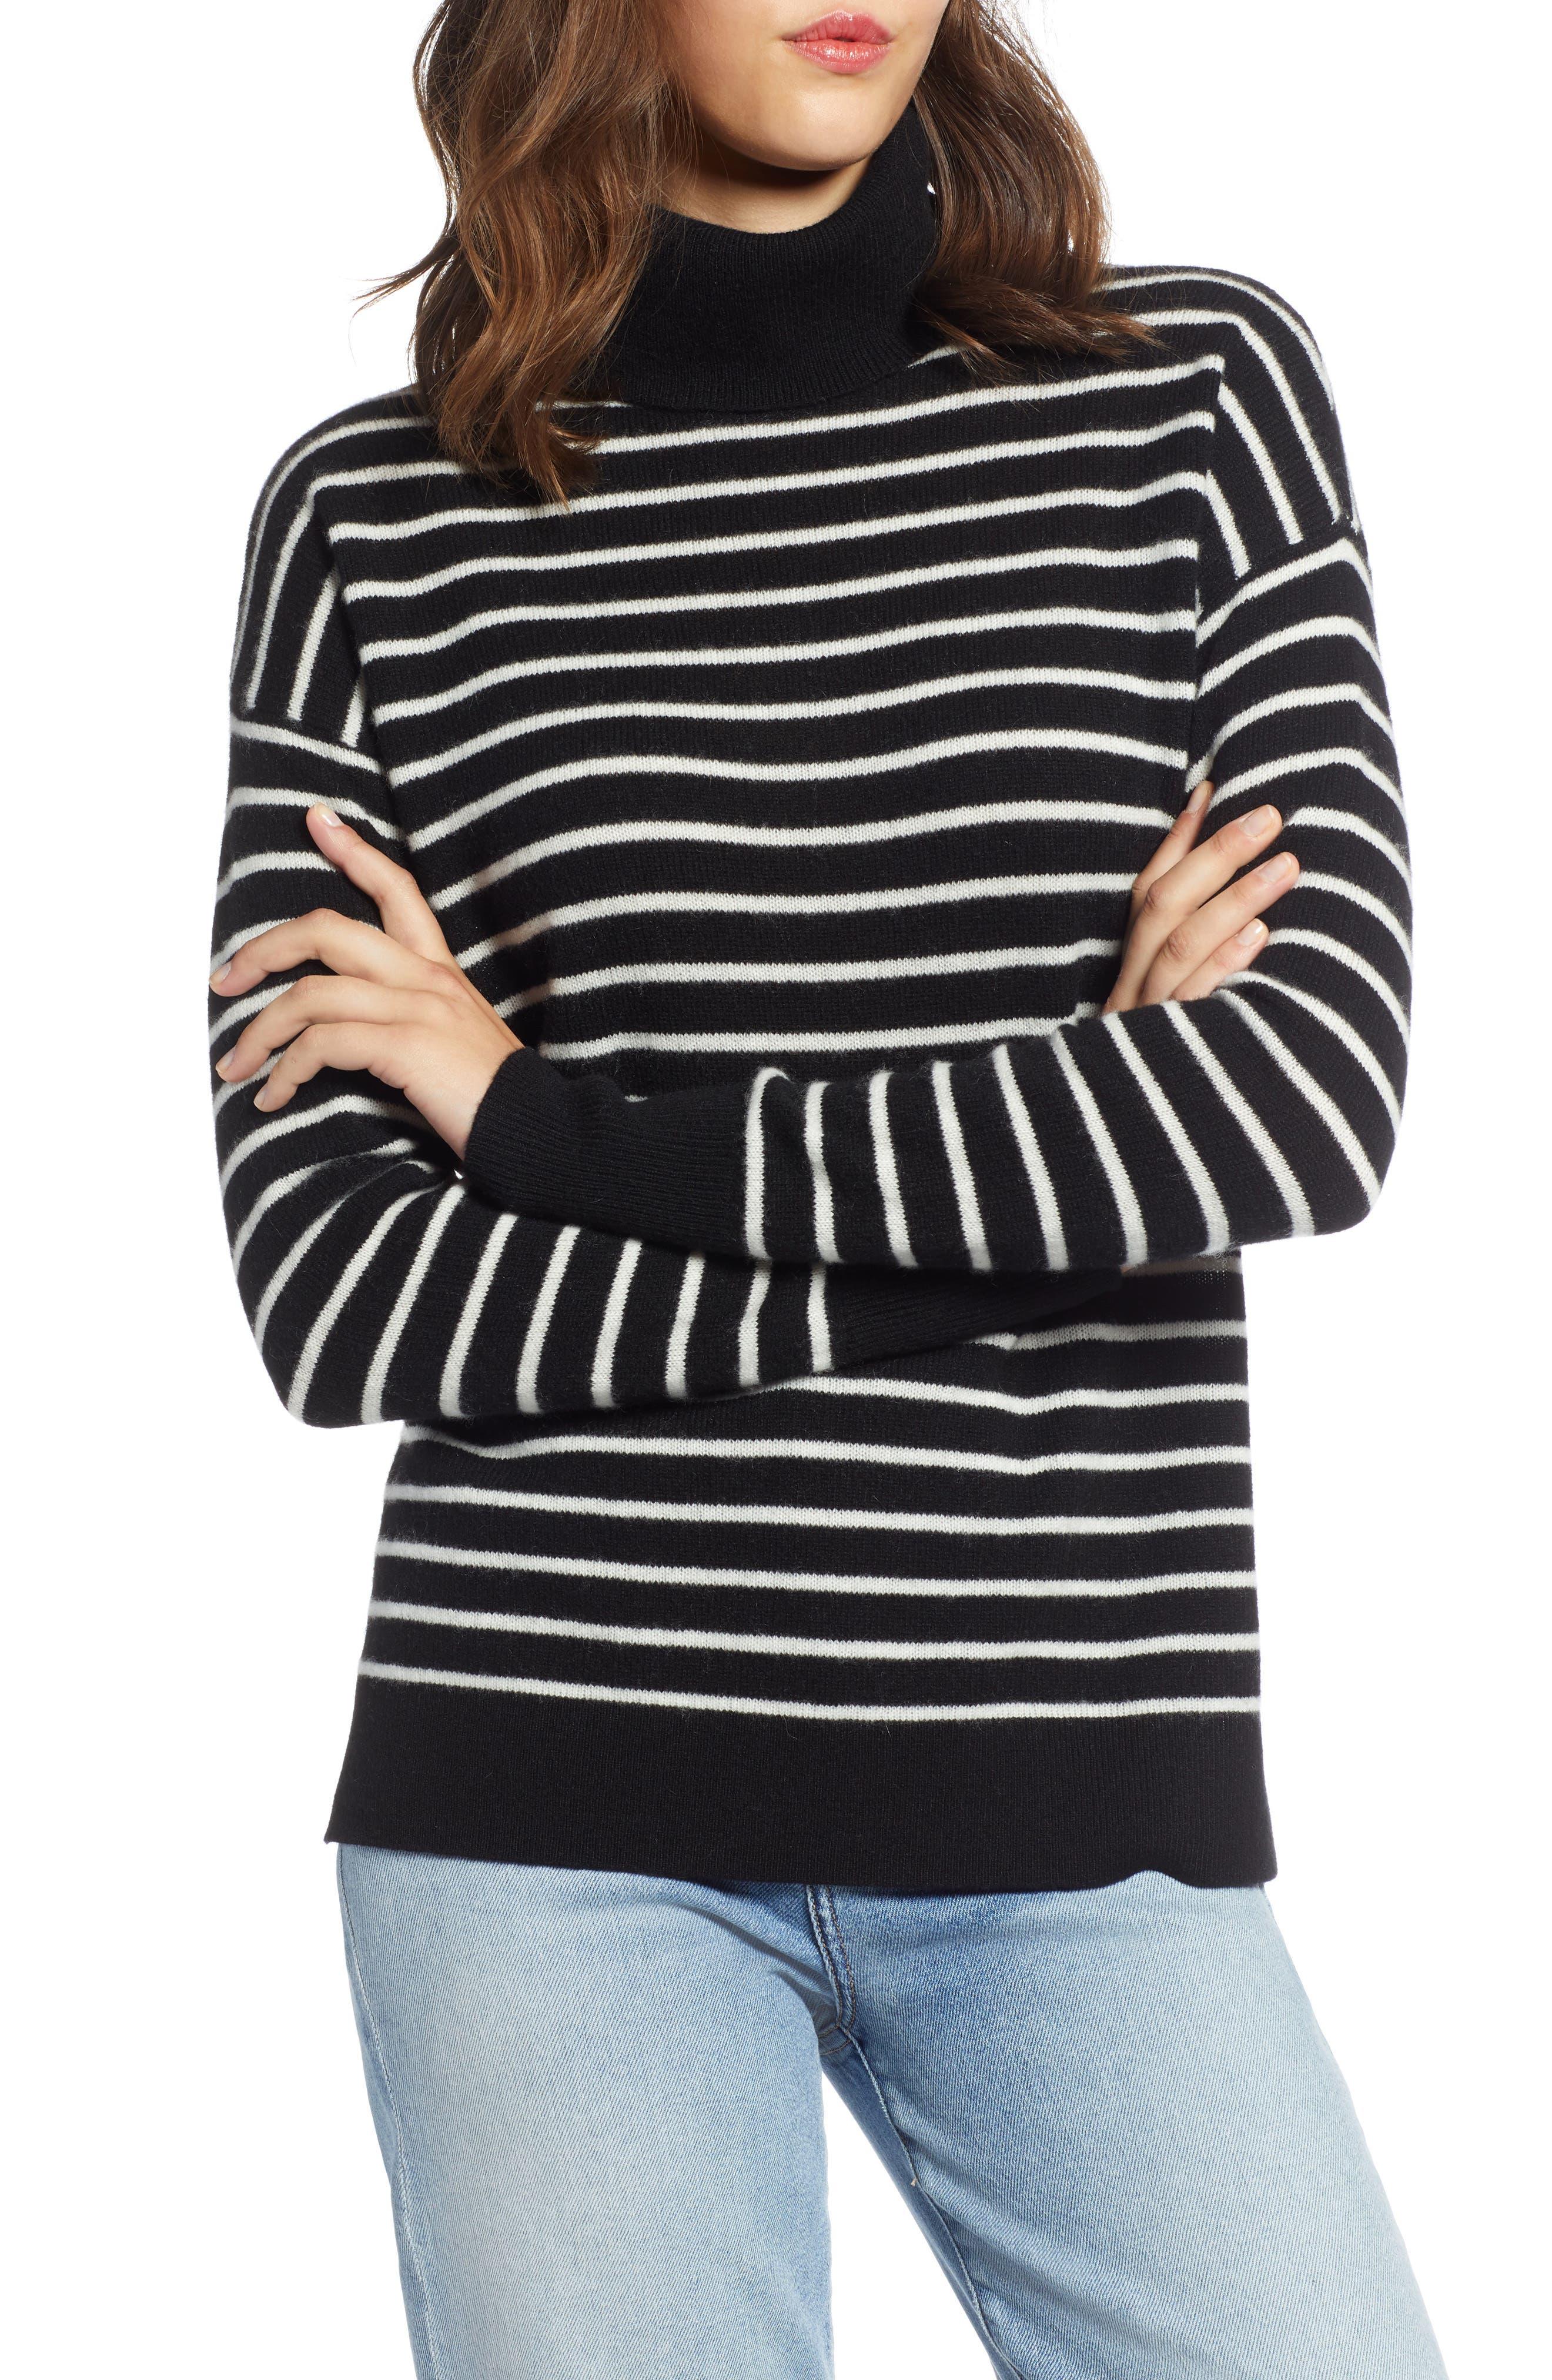 Cashmere Turtleneck Sweater,                             Main thumbnail 1, color,                             BLACK- IVORY STRIPE